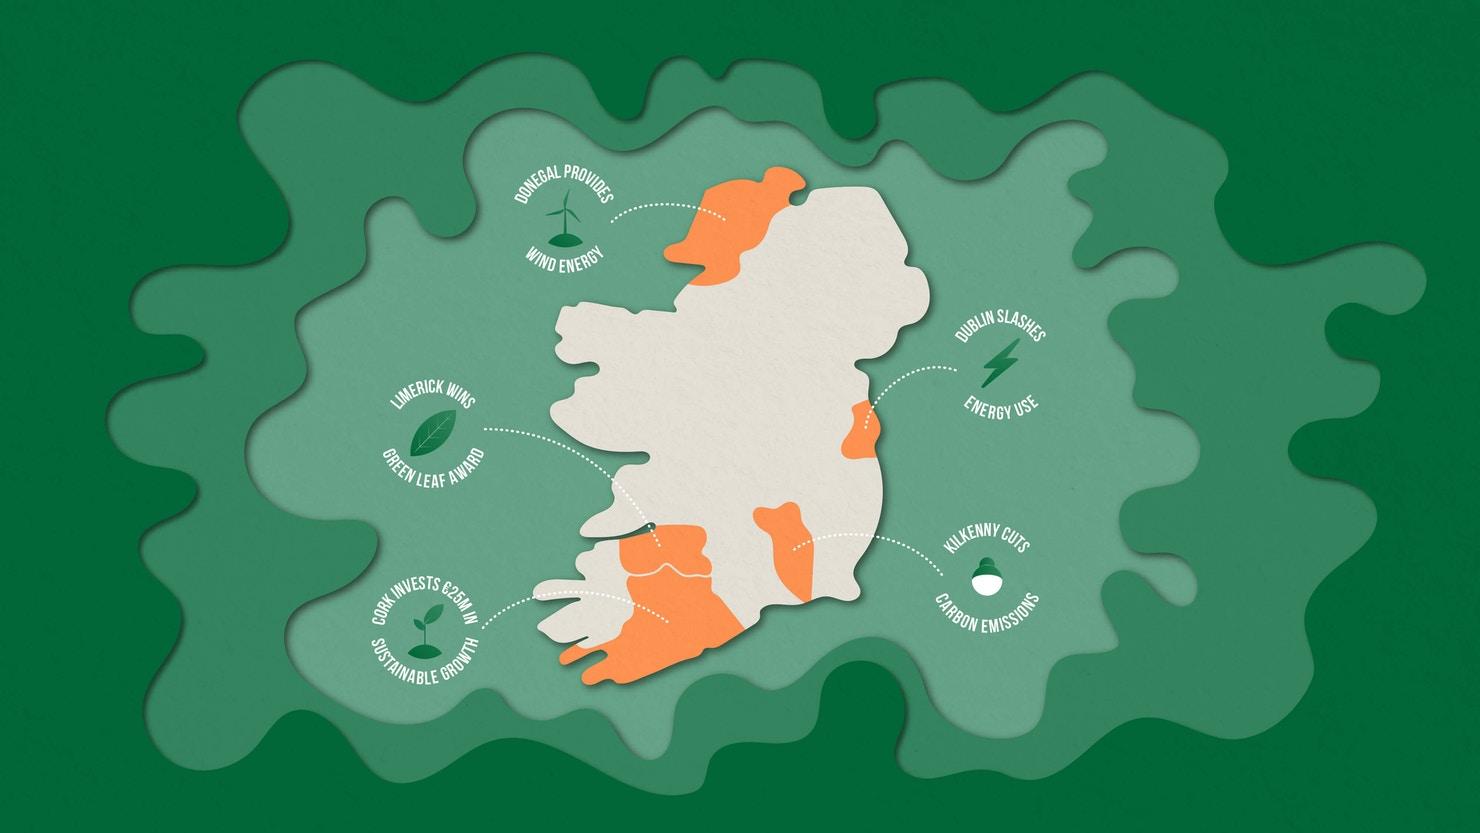 Global green initiatives – five irish communities' sustainable plans